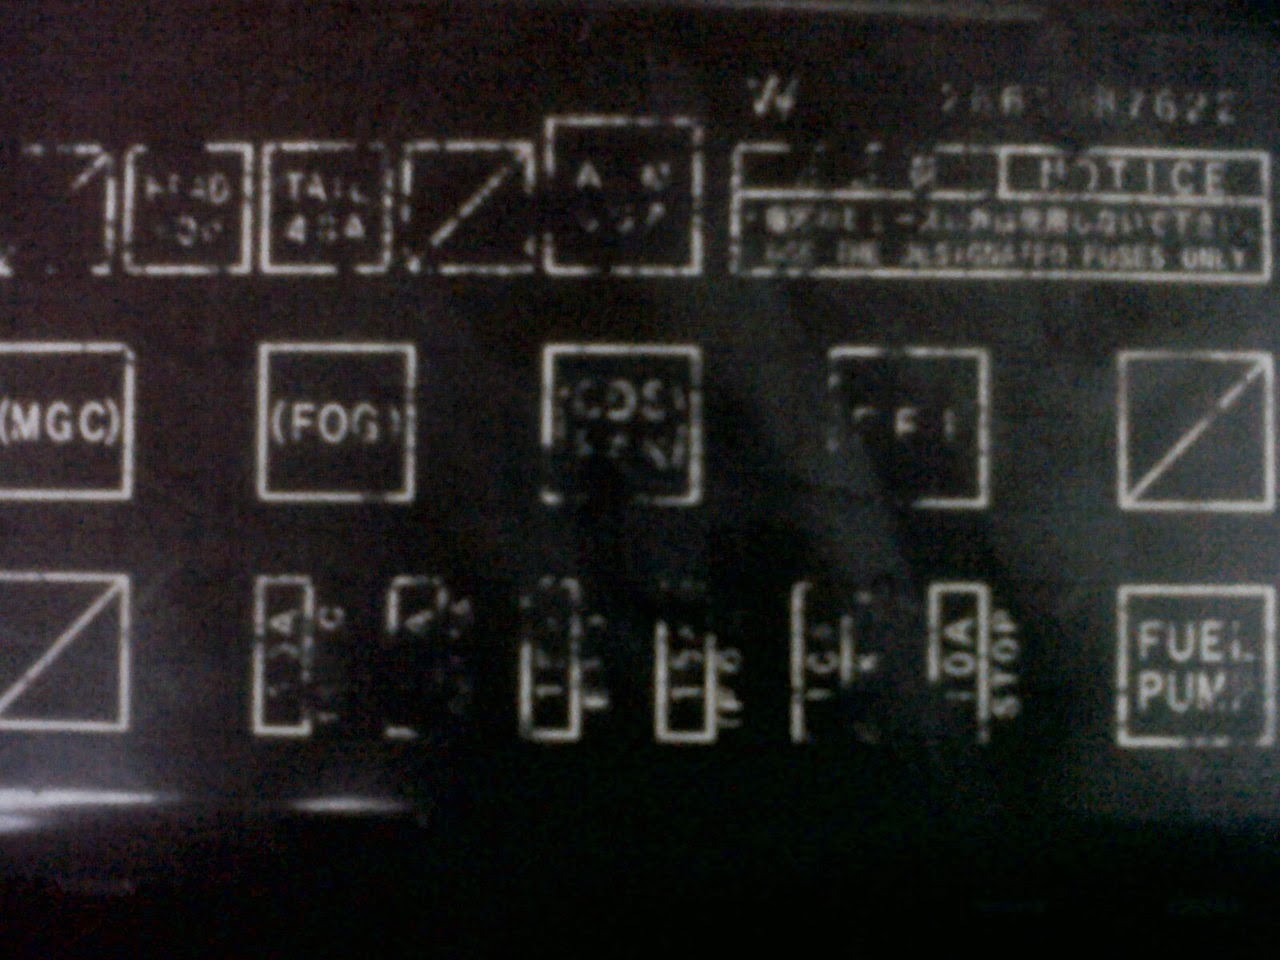 medium resolution of fuse box daihatsu taruna schematic diagramfuse box daihatsu taruna wiring diagram daihatsu wagon r fuse box